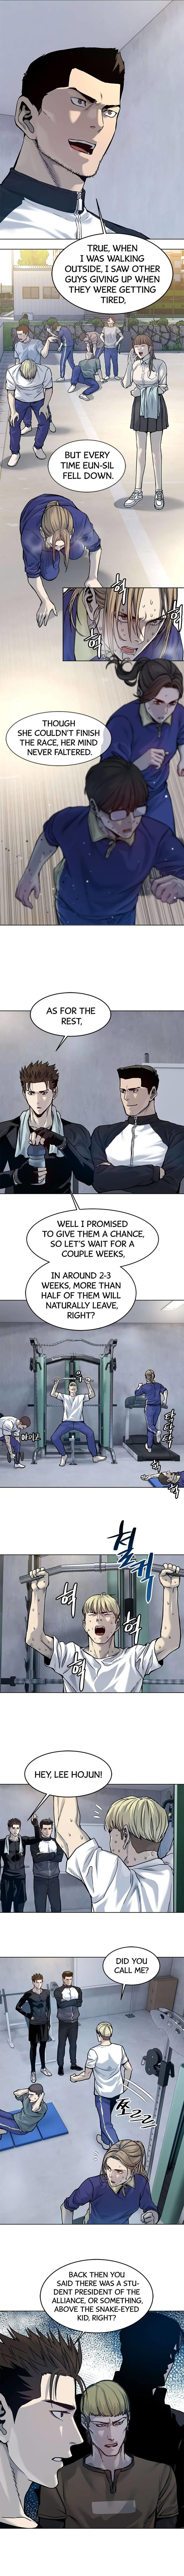 God Of Blackfield Chapter 90 page 10 - Mangakakalots.com